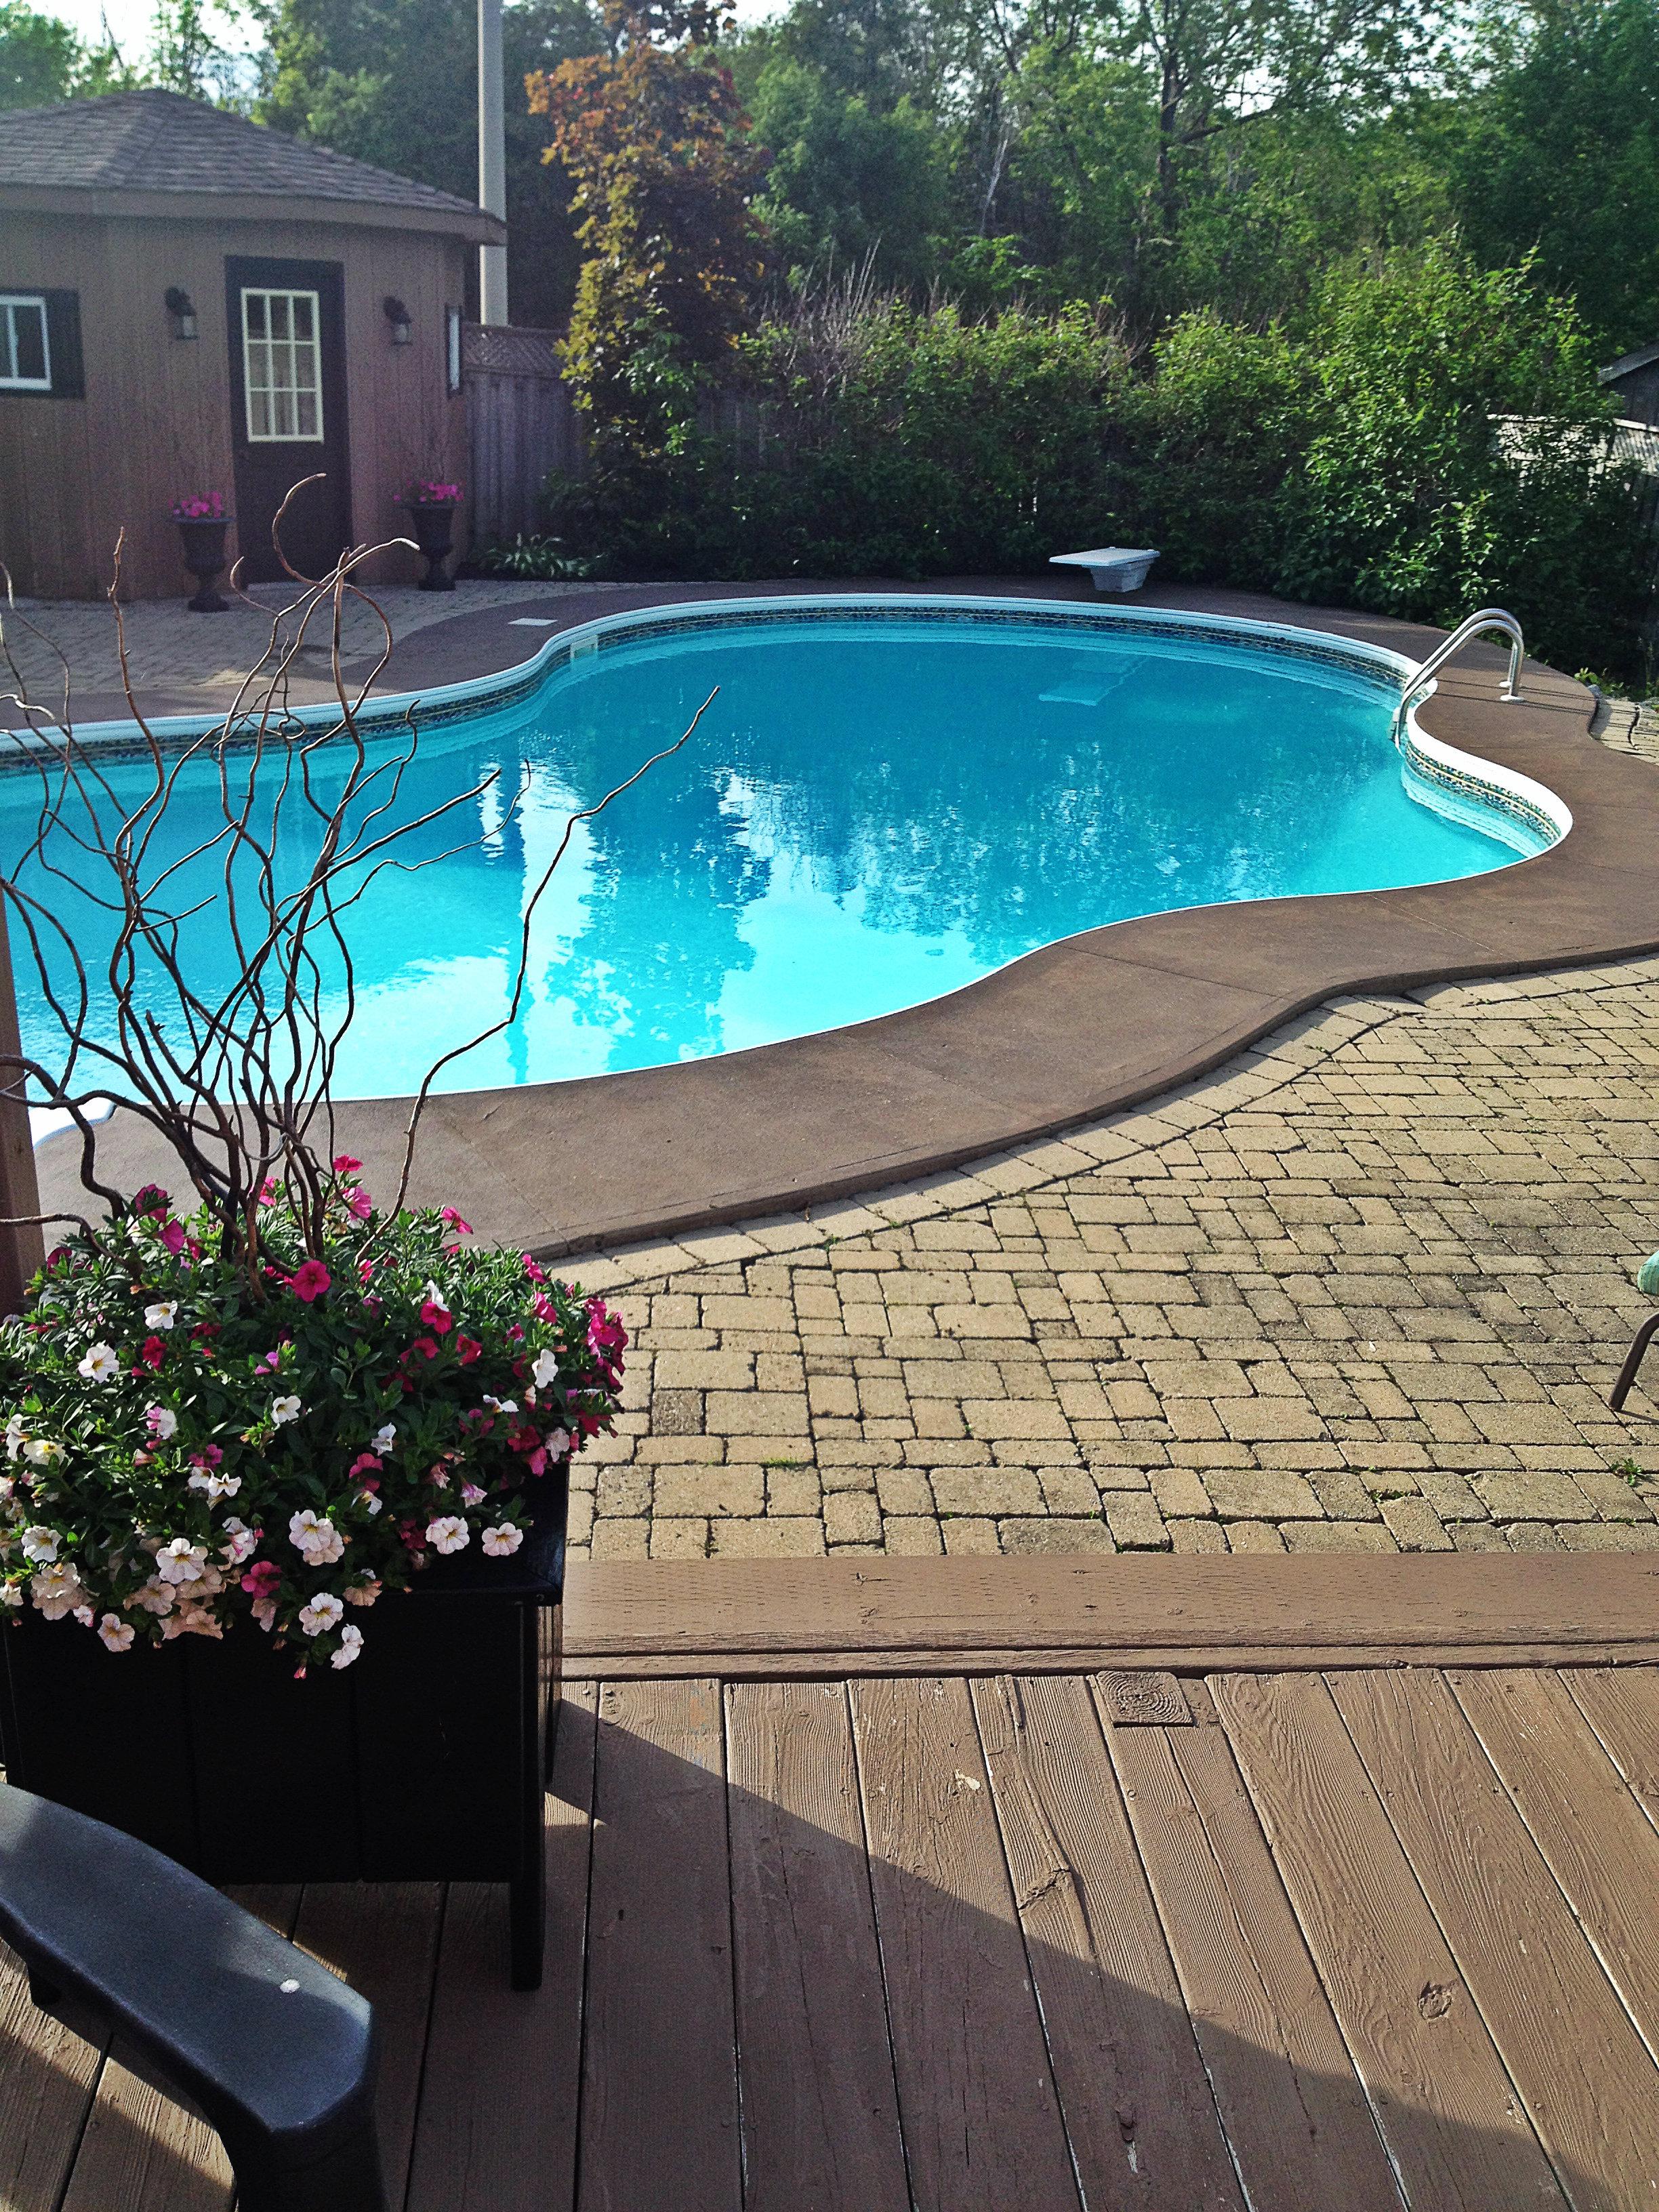 Backyard Pool | Tall Girl Meets World